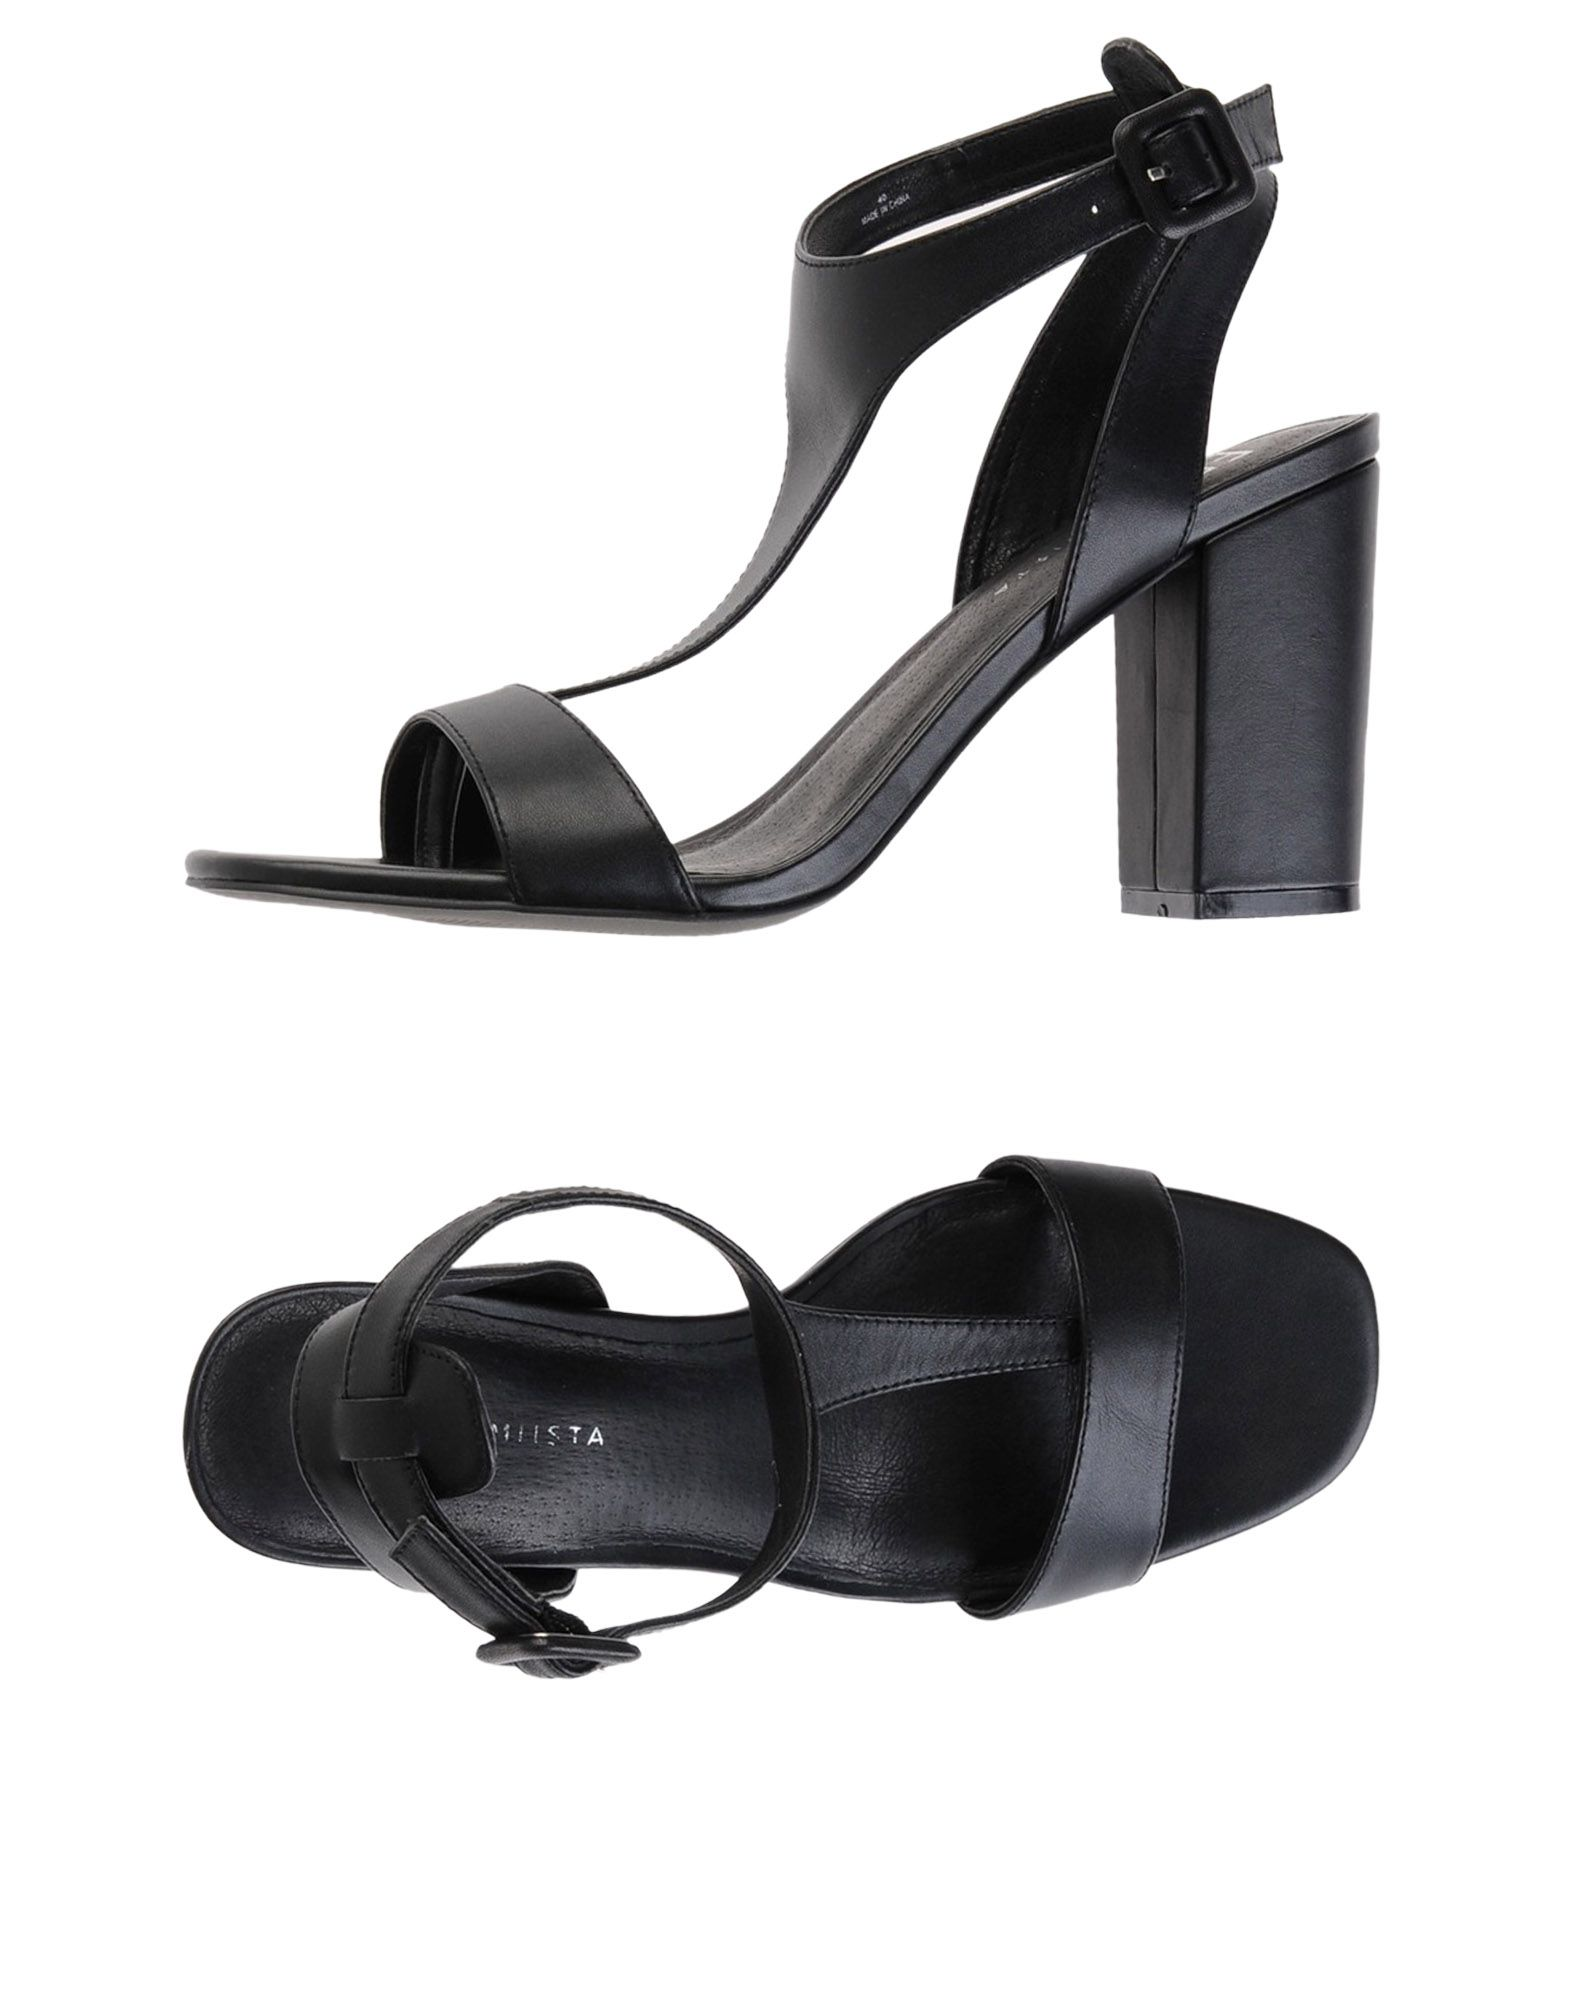 E8 By Miista Adeline  11469756GT Gute Qualität beliebte Schuhe